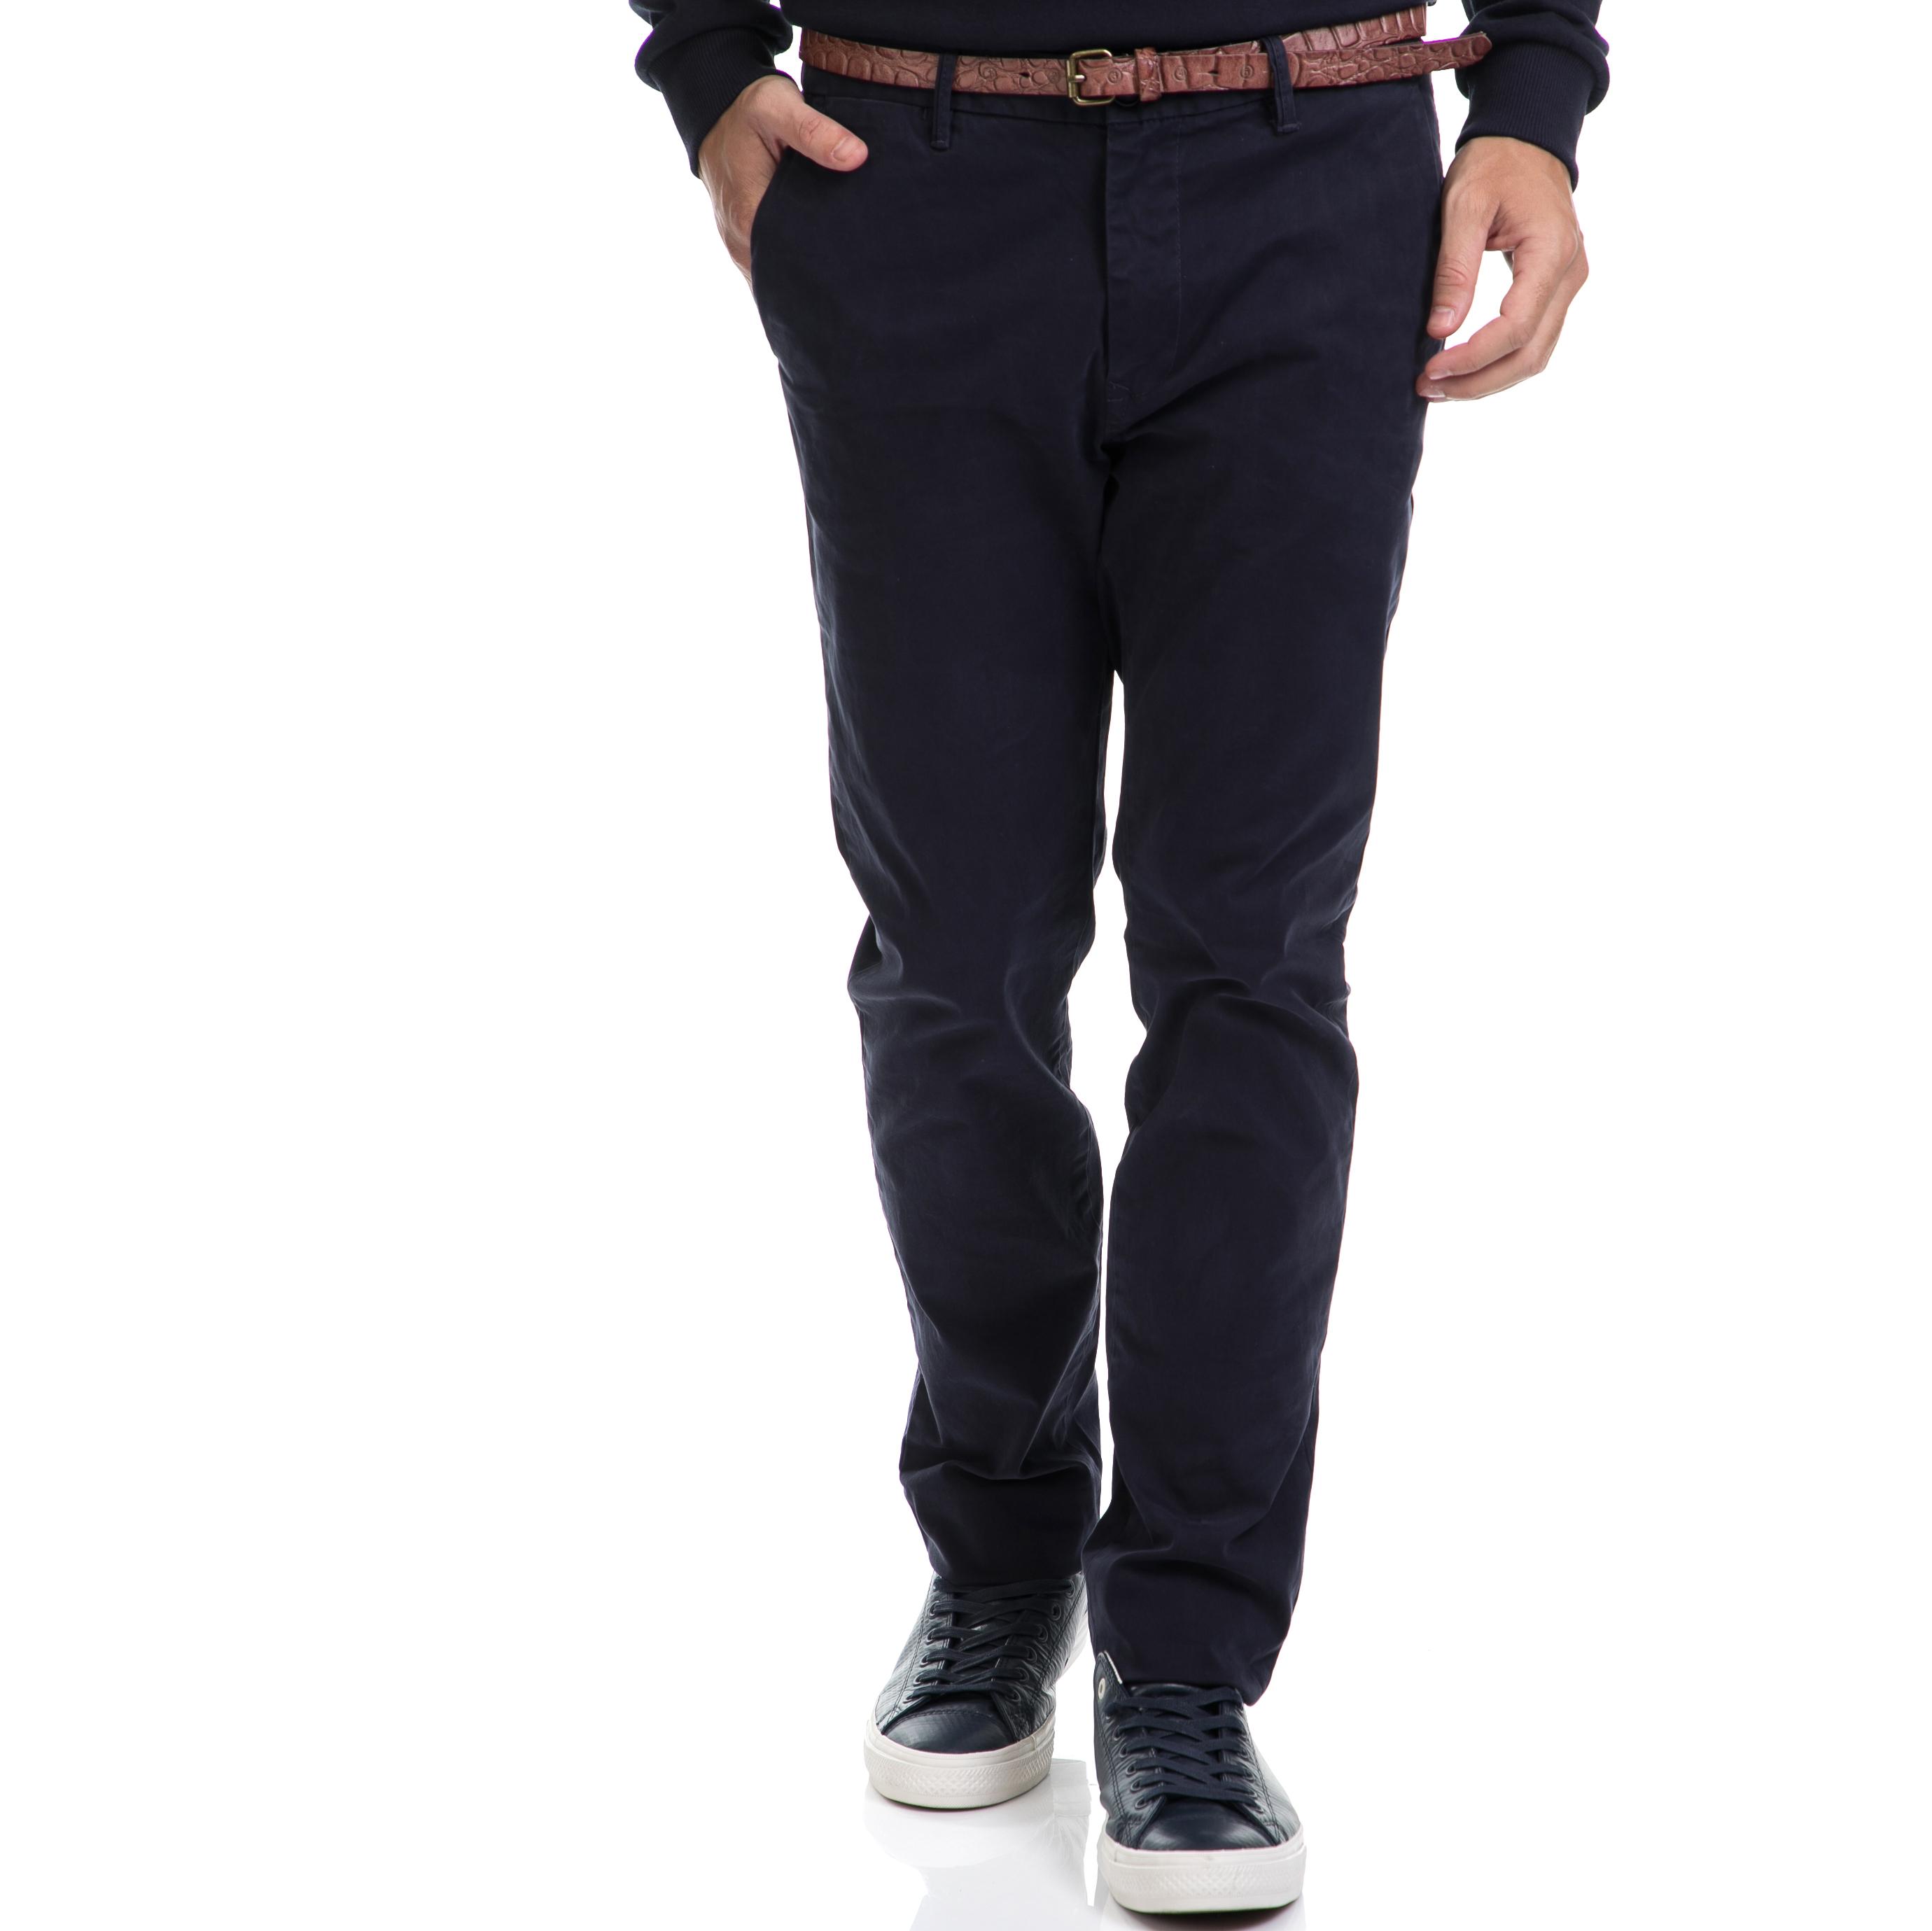 SCOTCH & SODA – Ανδρικό παντελόνι SCOTCH & SODA μπλε